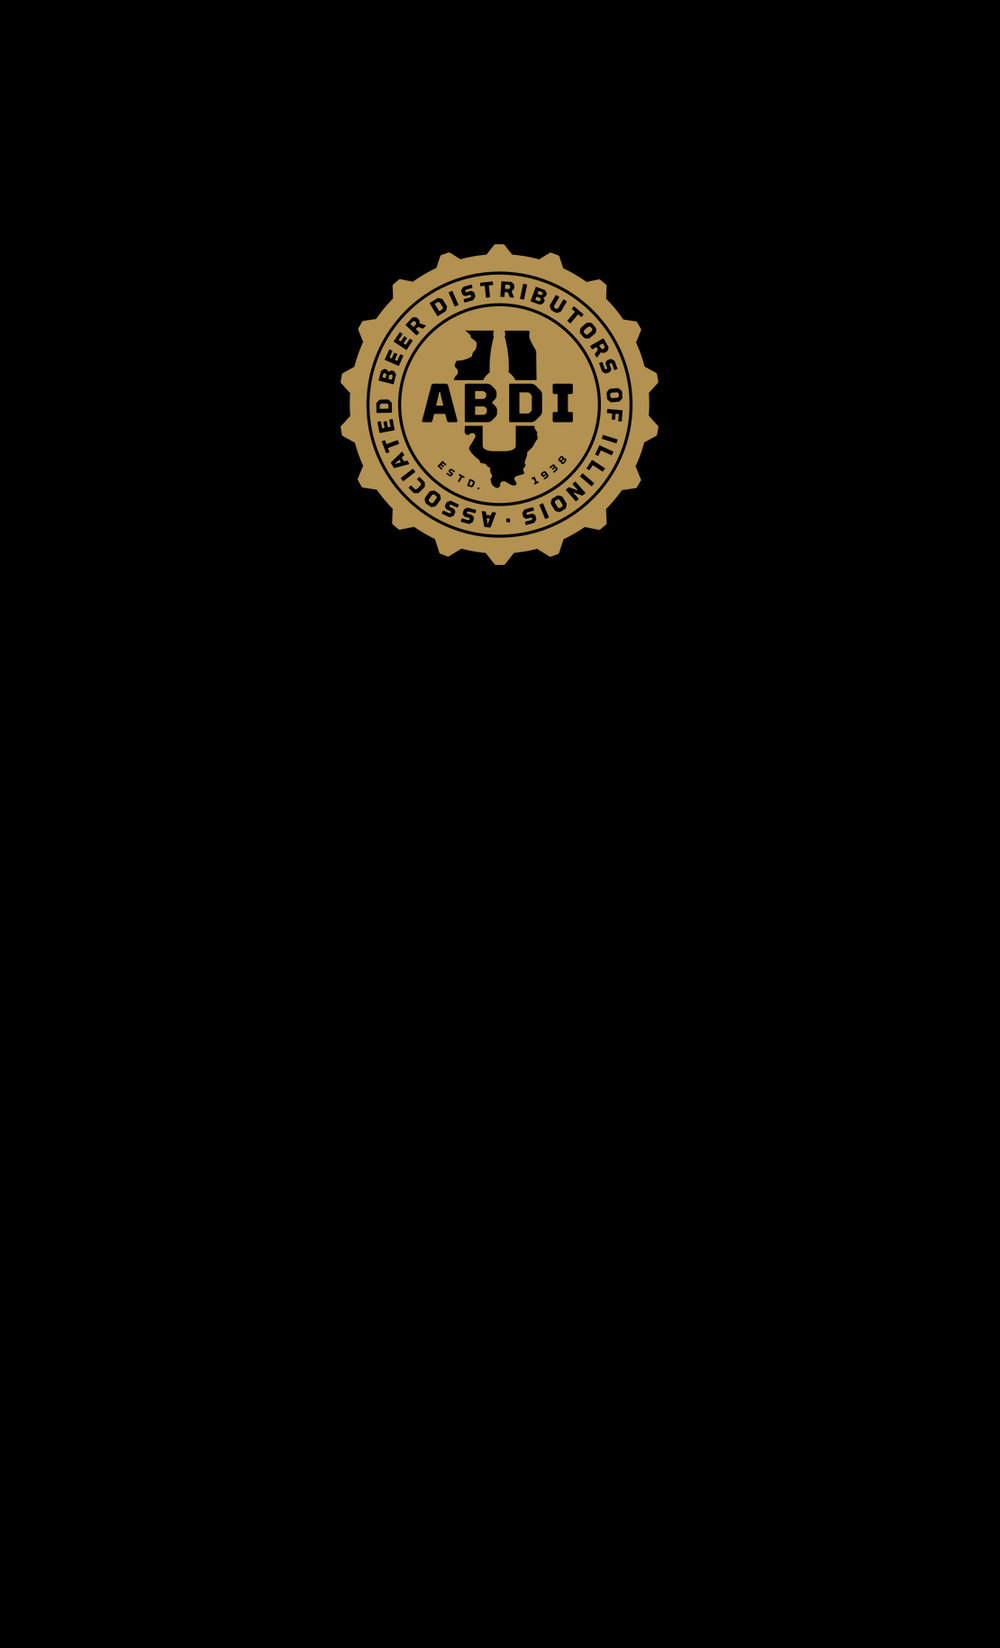 Associated Beer Distributors of Illinois - Logo & Identity DesignStrength.Expertise.Legacy.